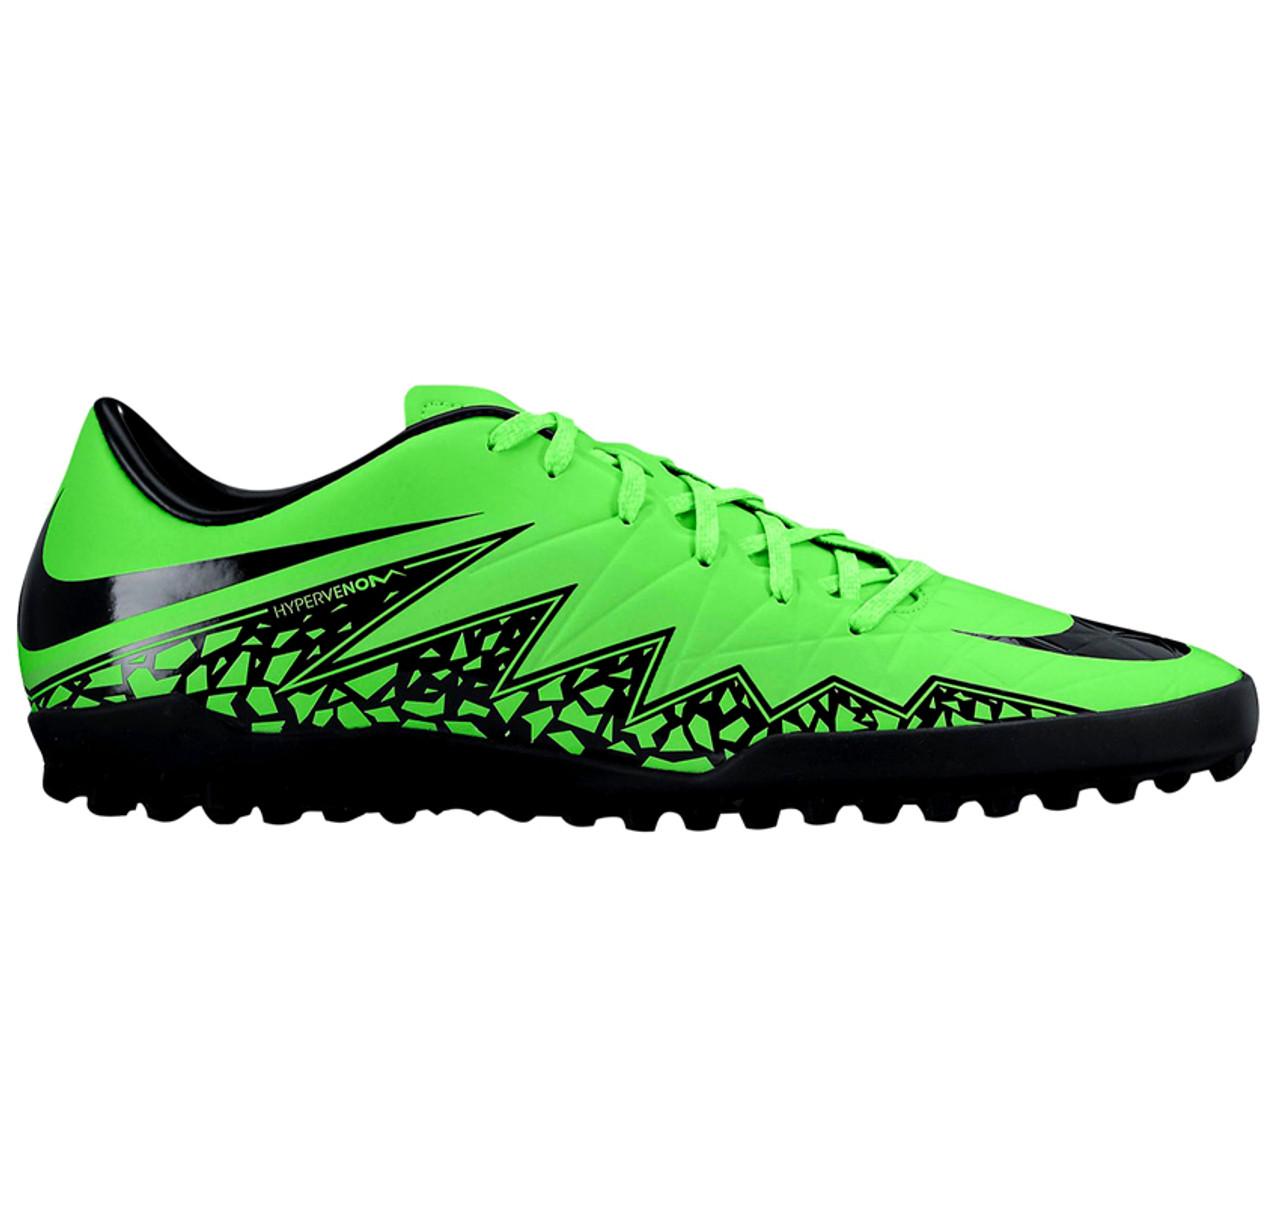 061f66095 NIKE JR HYPERVENOM PHELON II TF GREEN turf soccer shoes - Soccer Plus